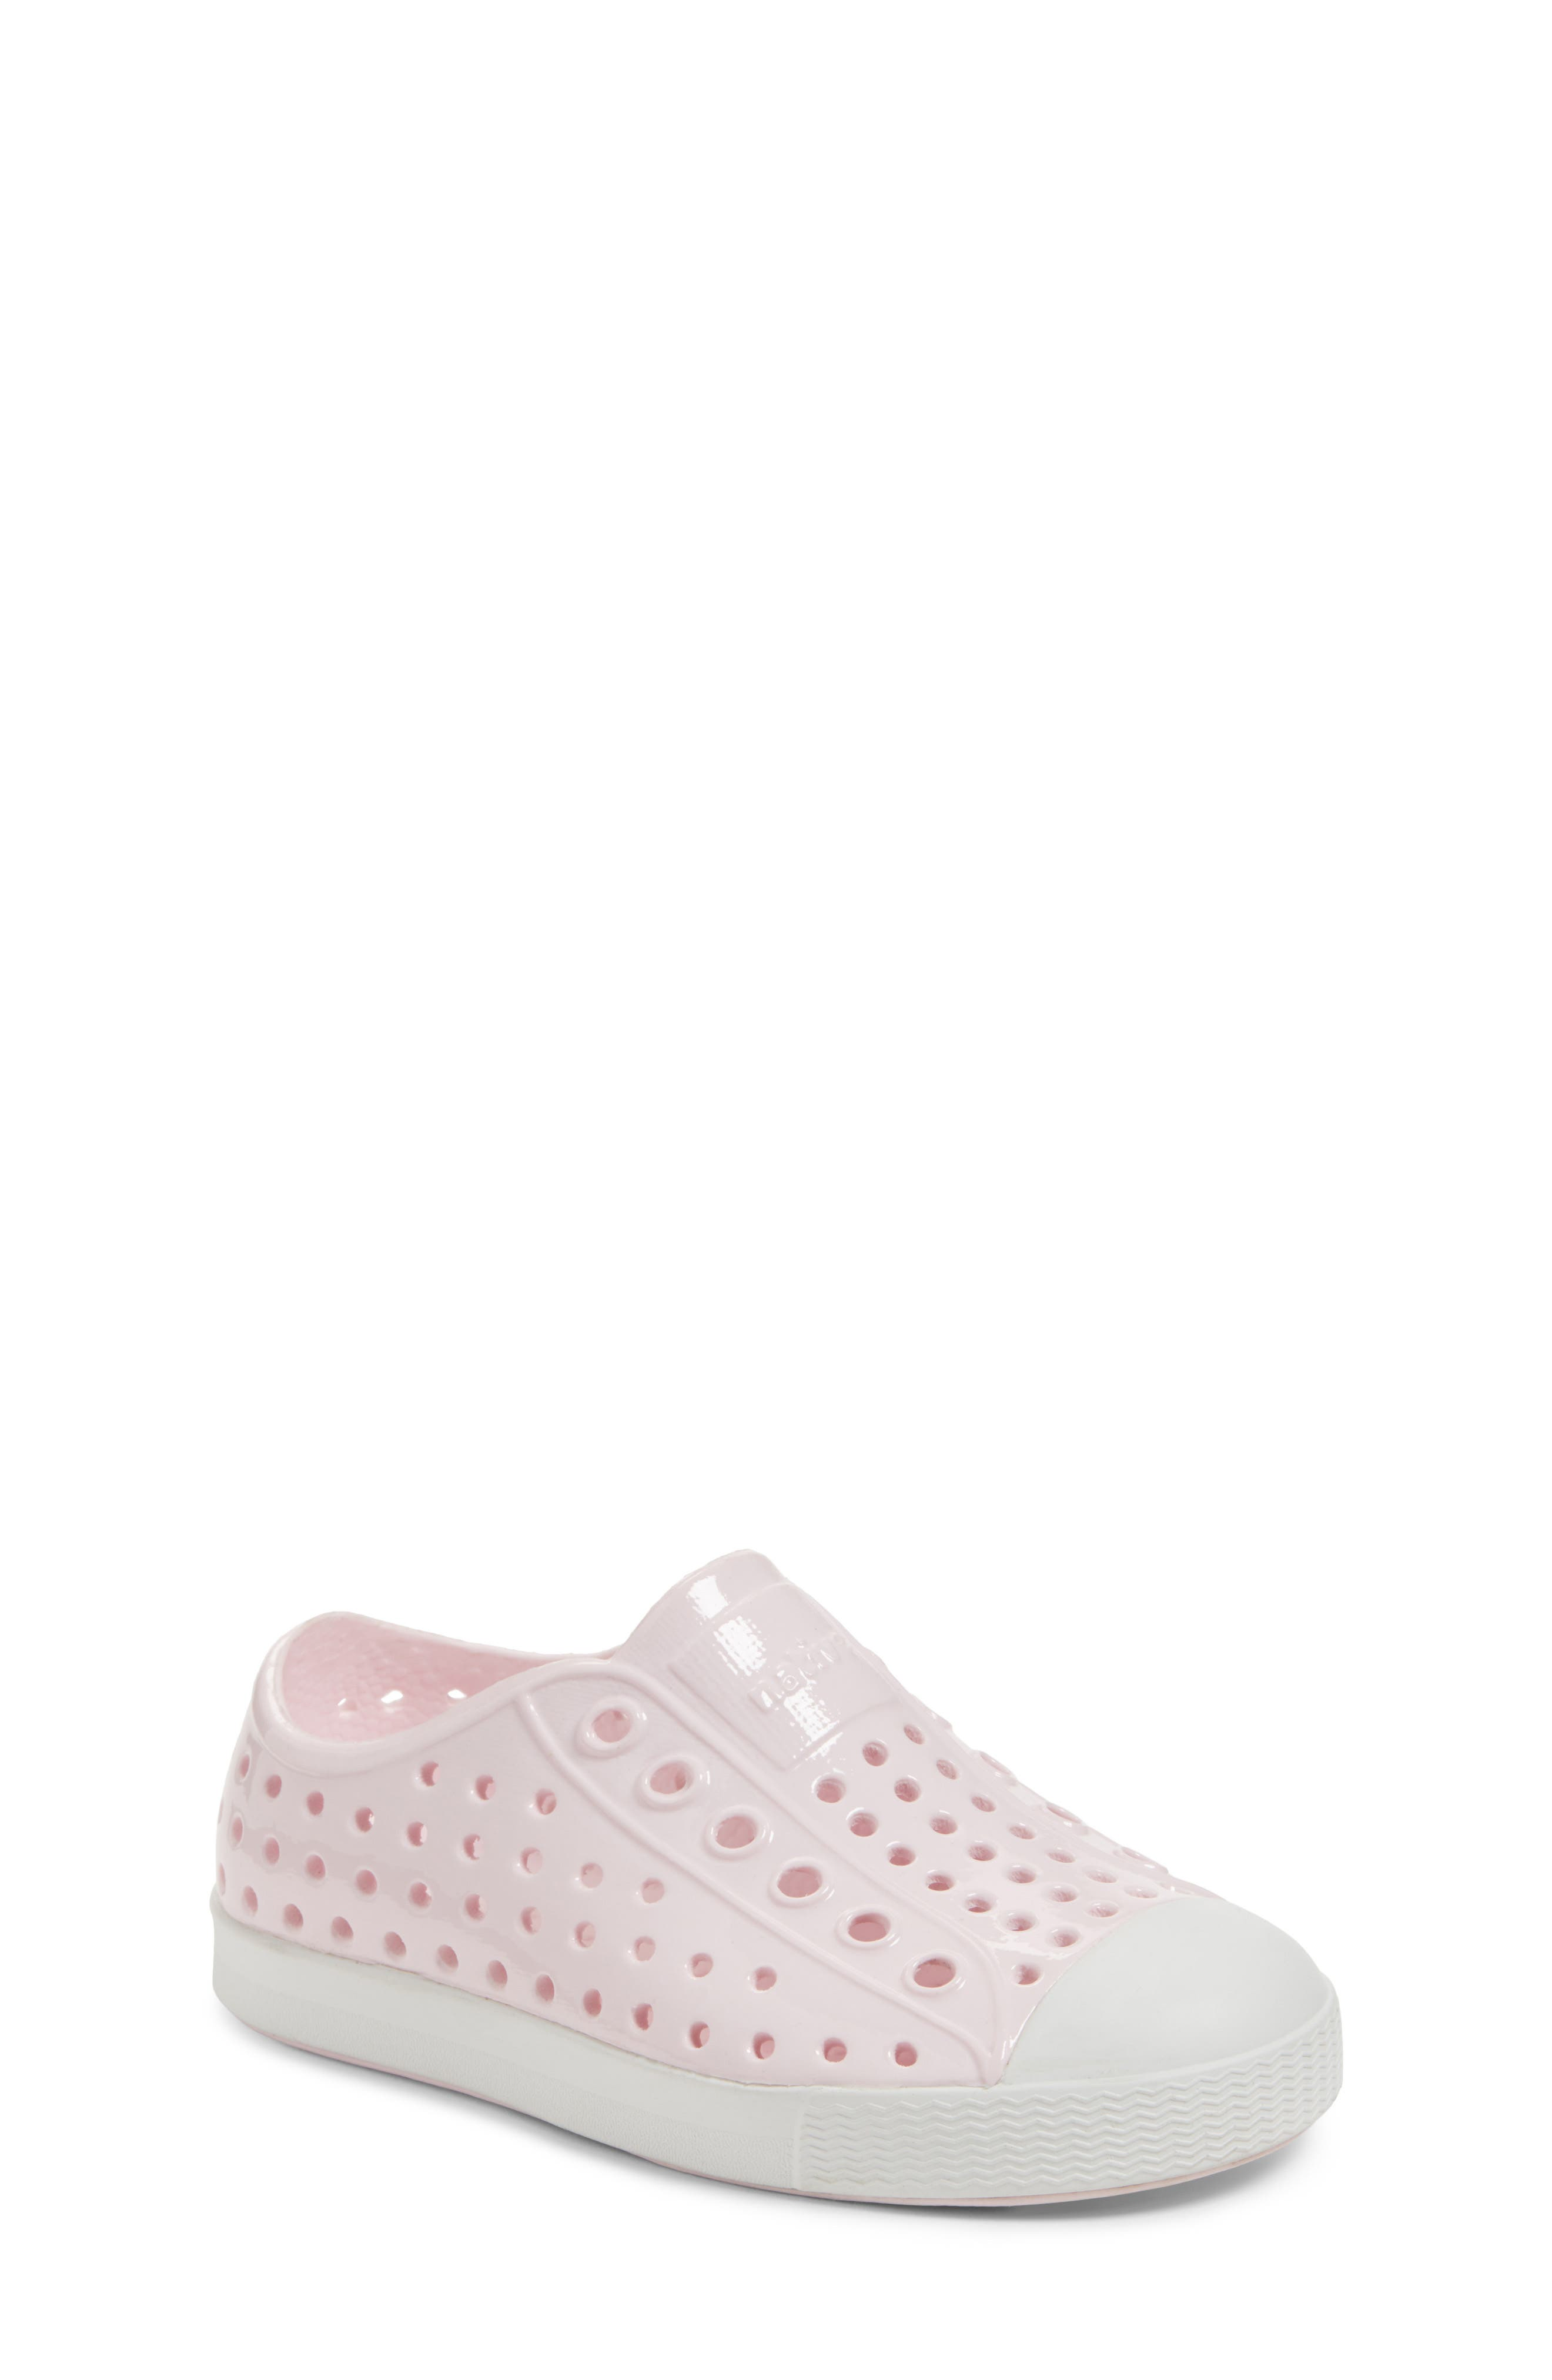 Jefferson Glossy Slip-On Sneaker,                             Main thumbnail 1, color,                             MILK PINK/ SHELL WHITE